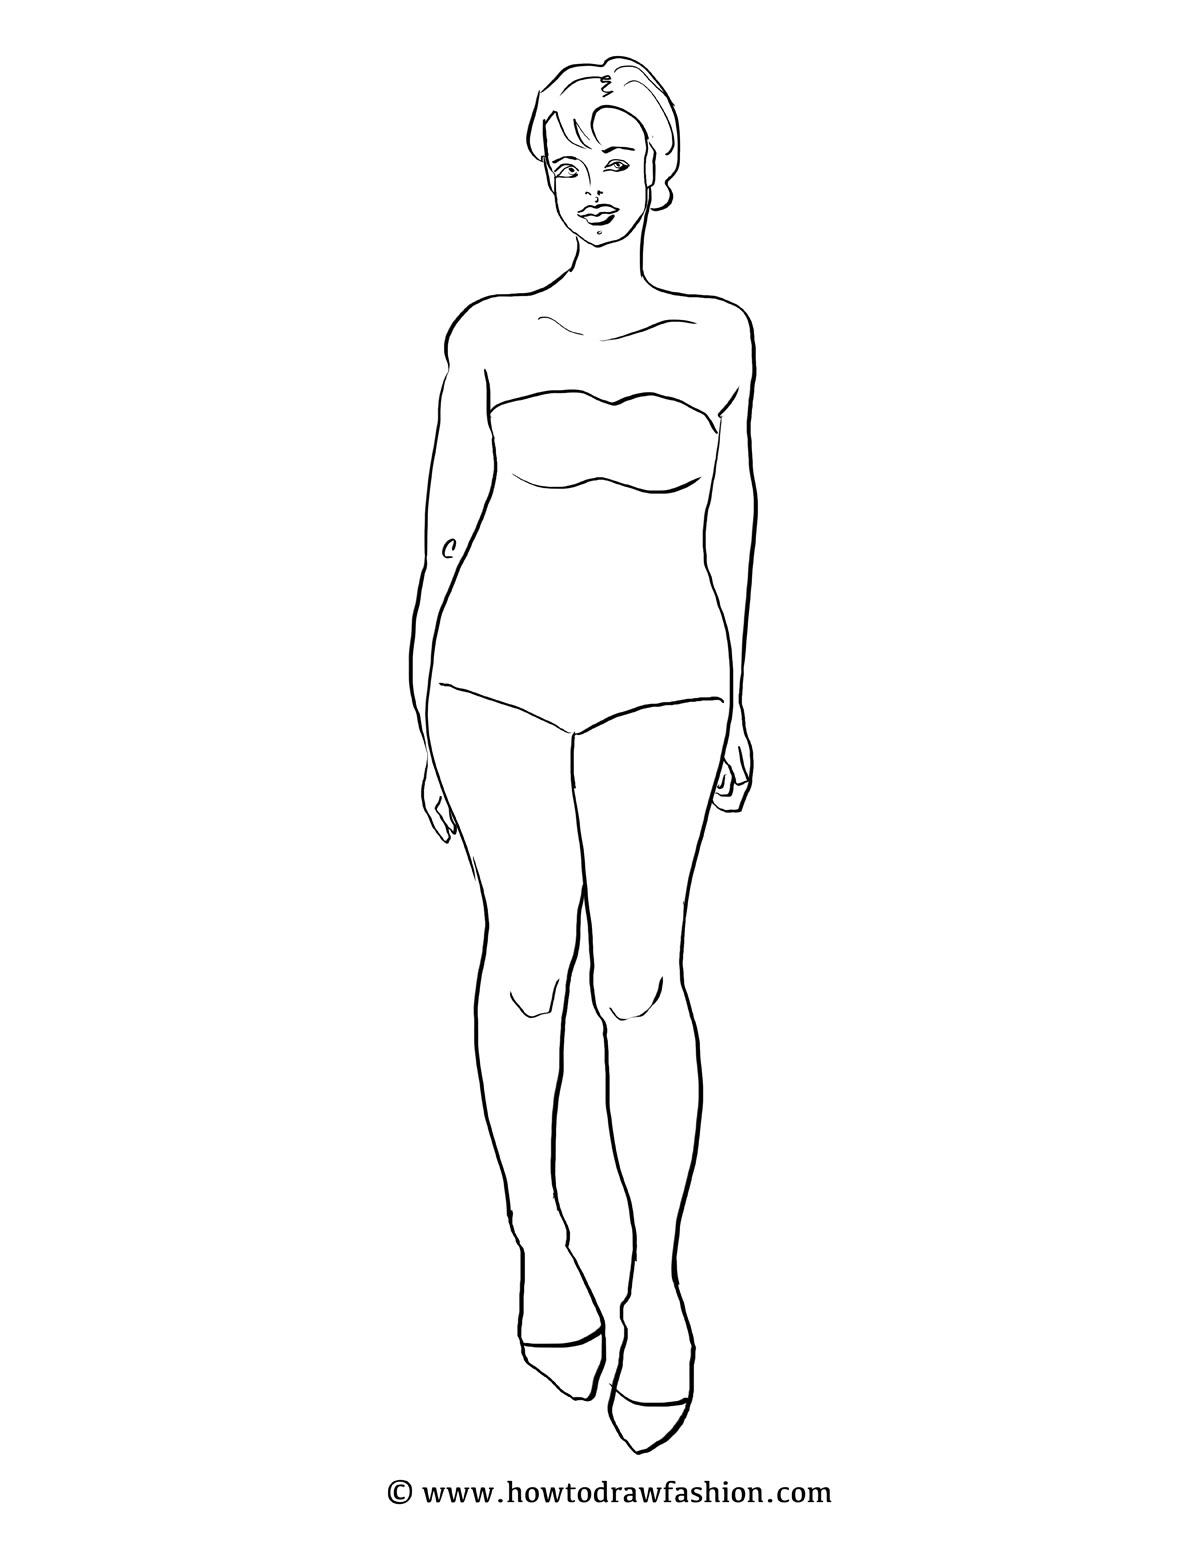 Blank Body Drawing At Getdrawings